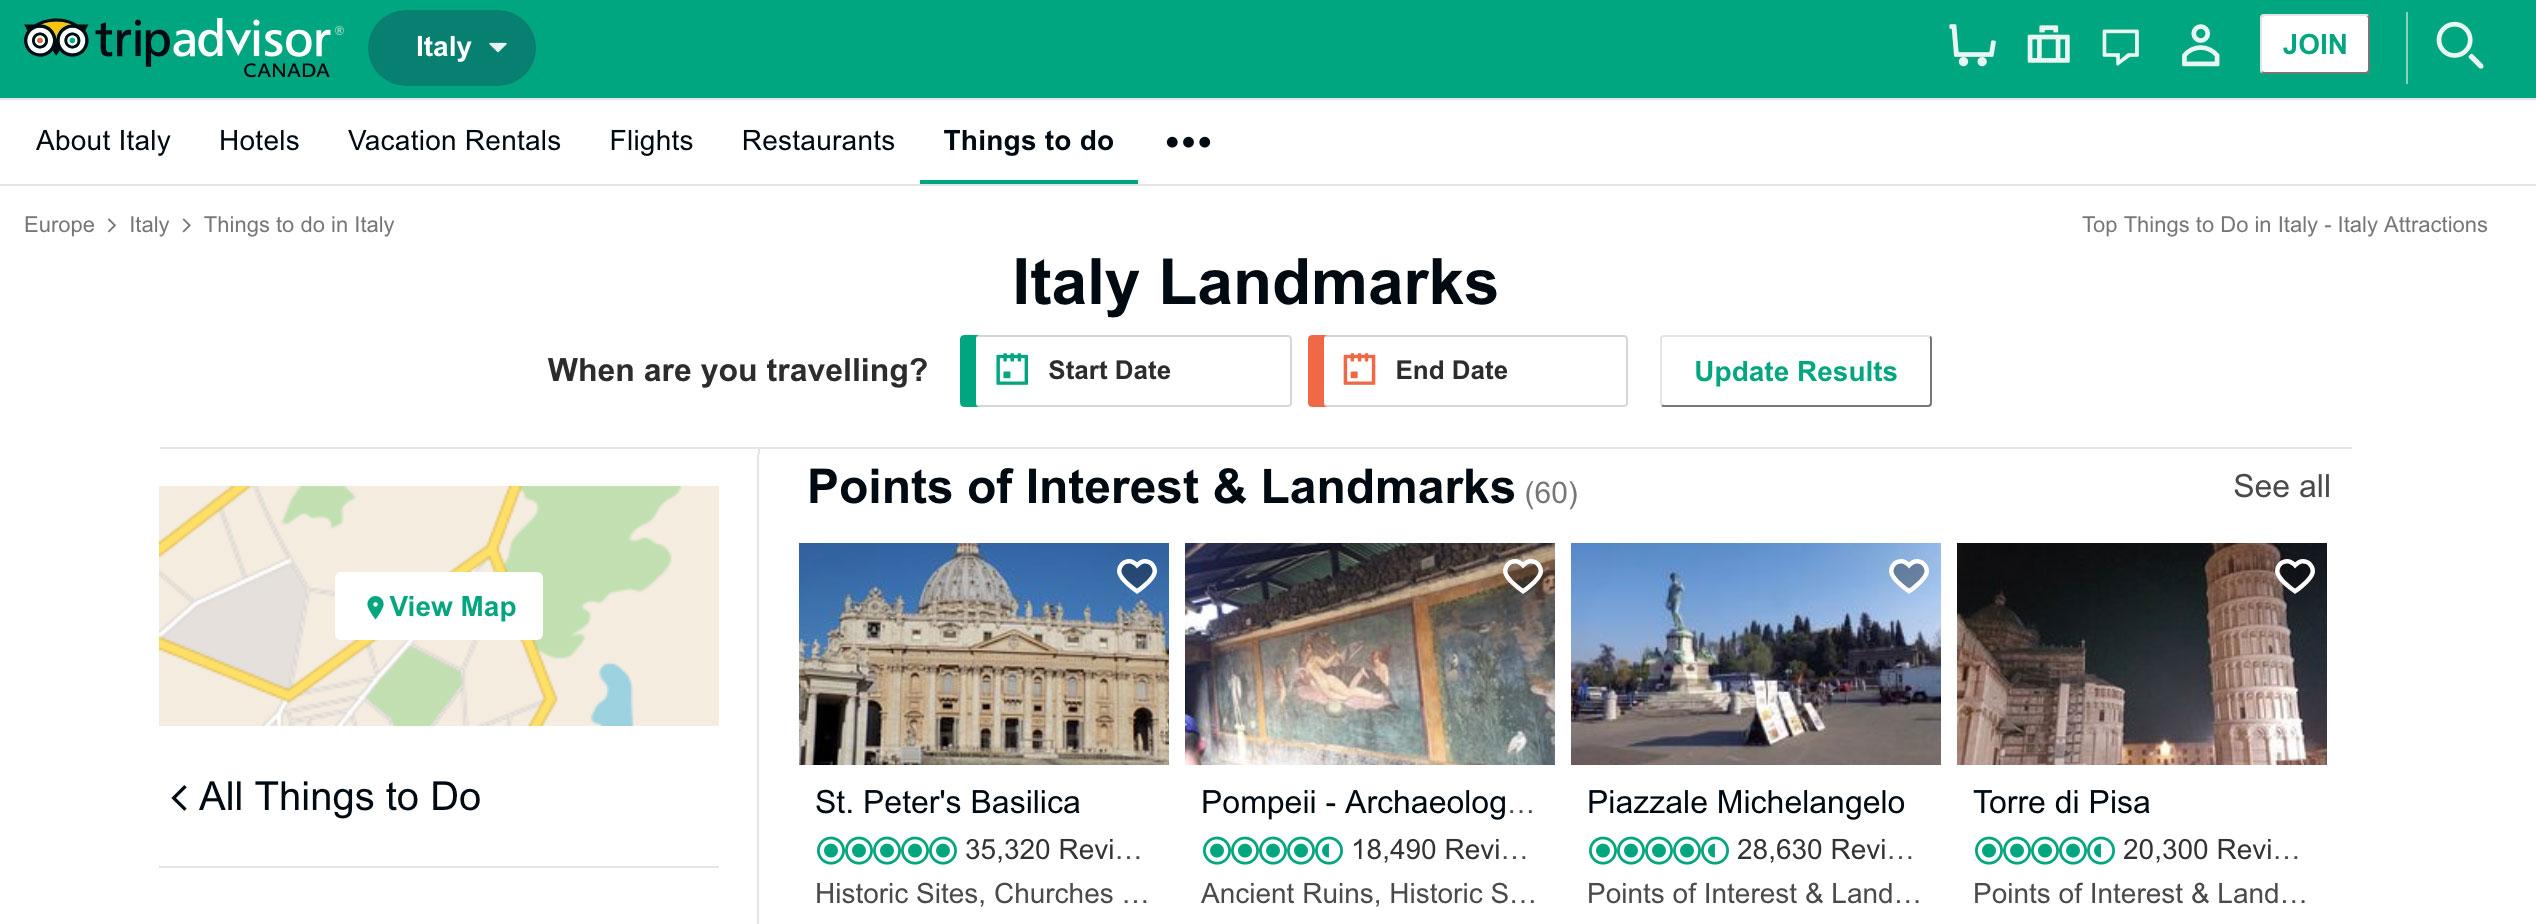 Italy Sights & Landmarks - Trip Advisor